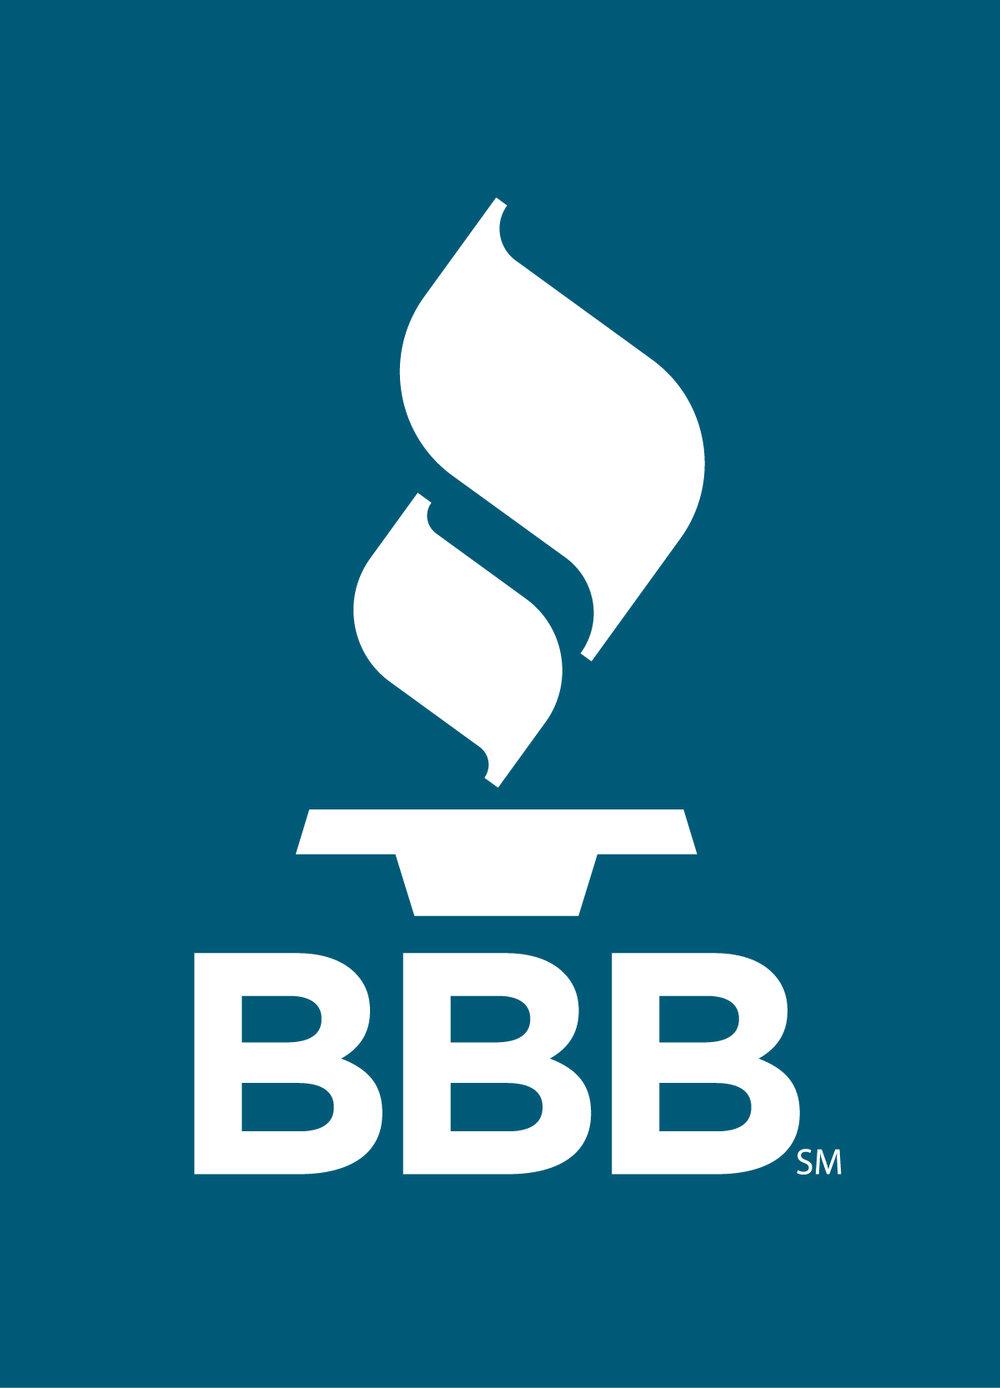 BBB_Reverse-blue-rgb.jpg